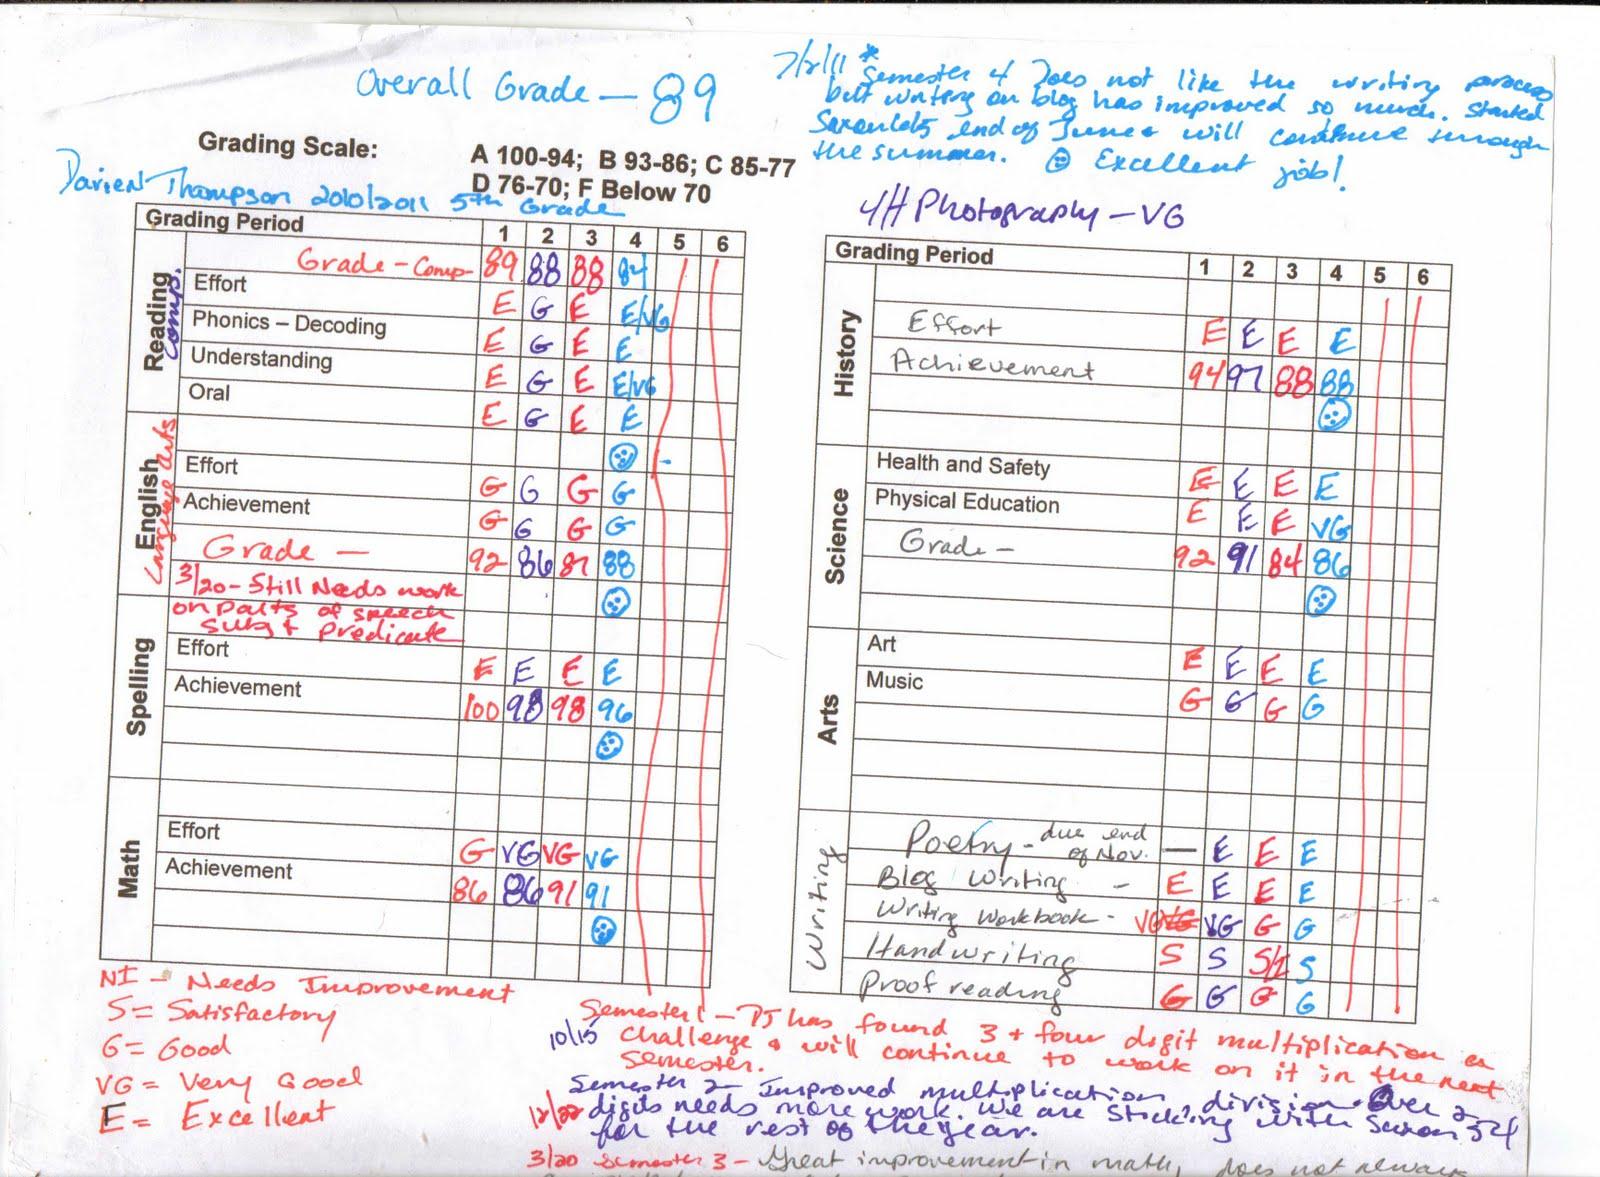 2010 2011 School Year Report Card